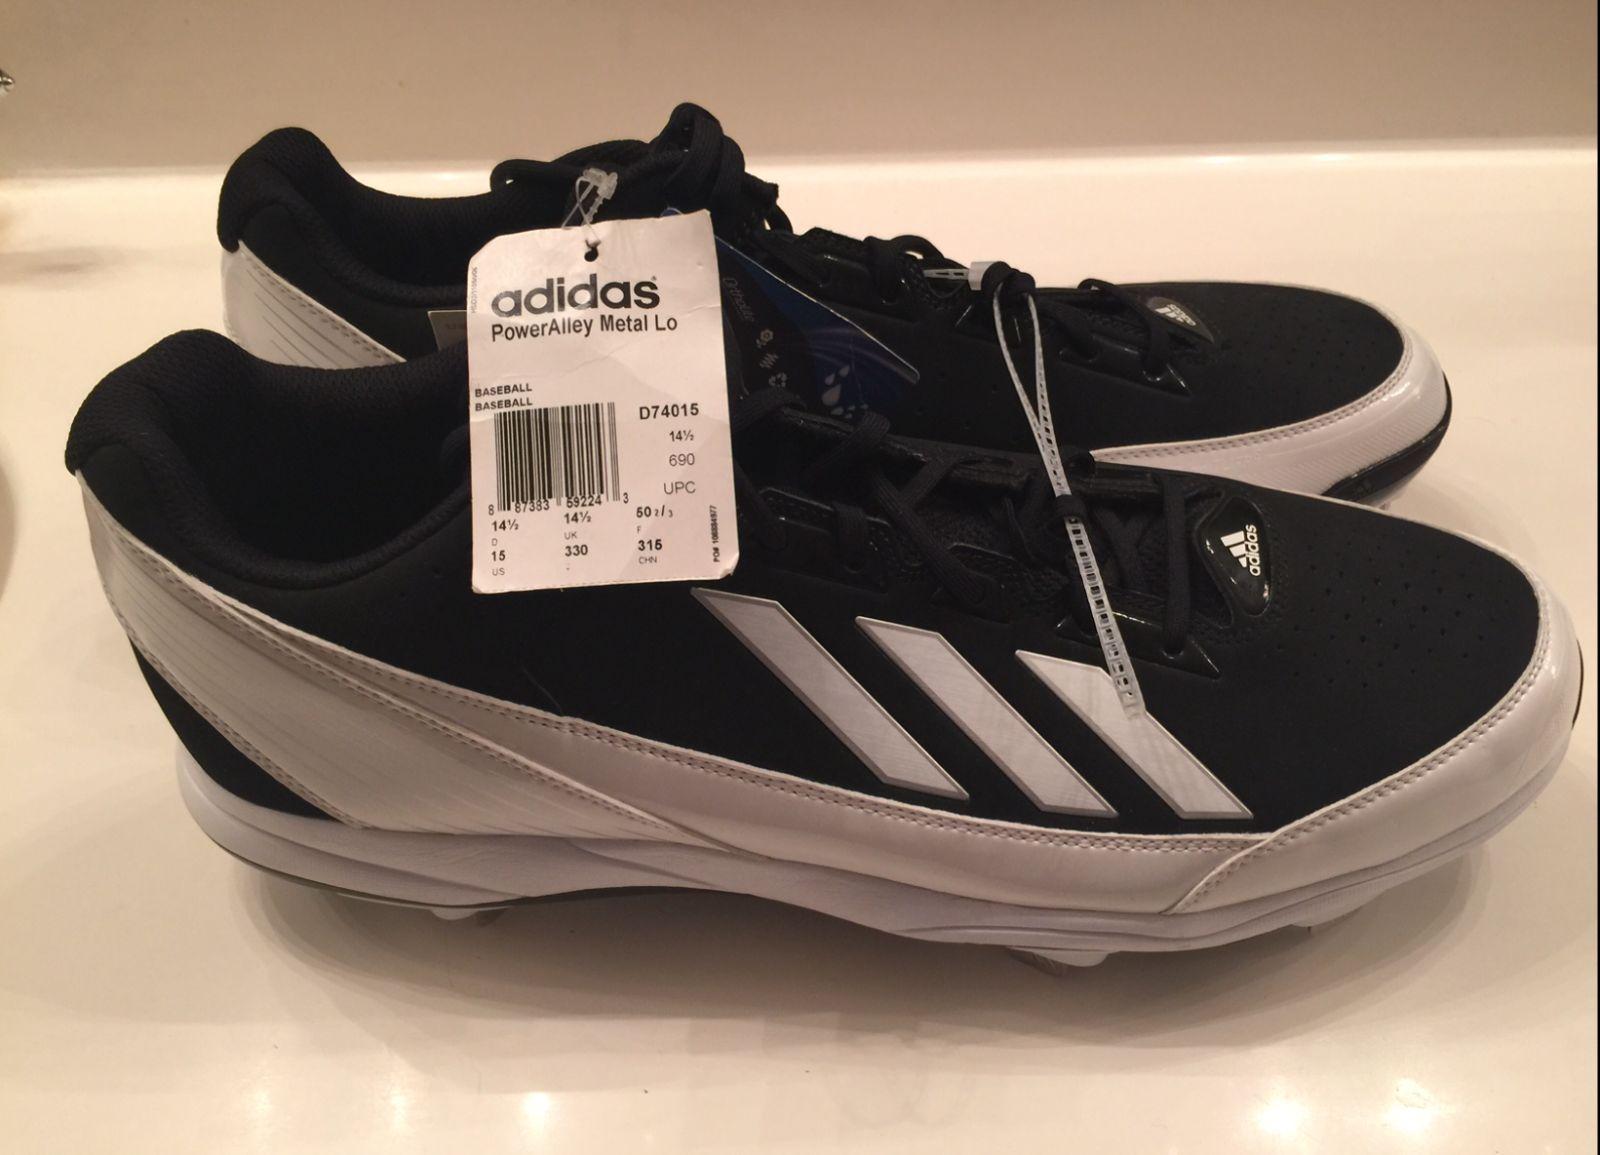 new adidas poweralley metal baseball cleats spikes black